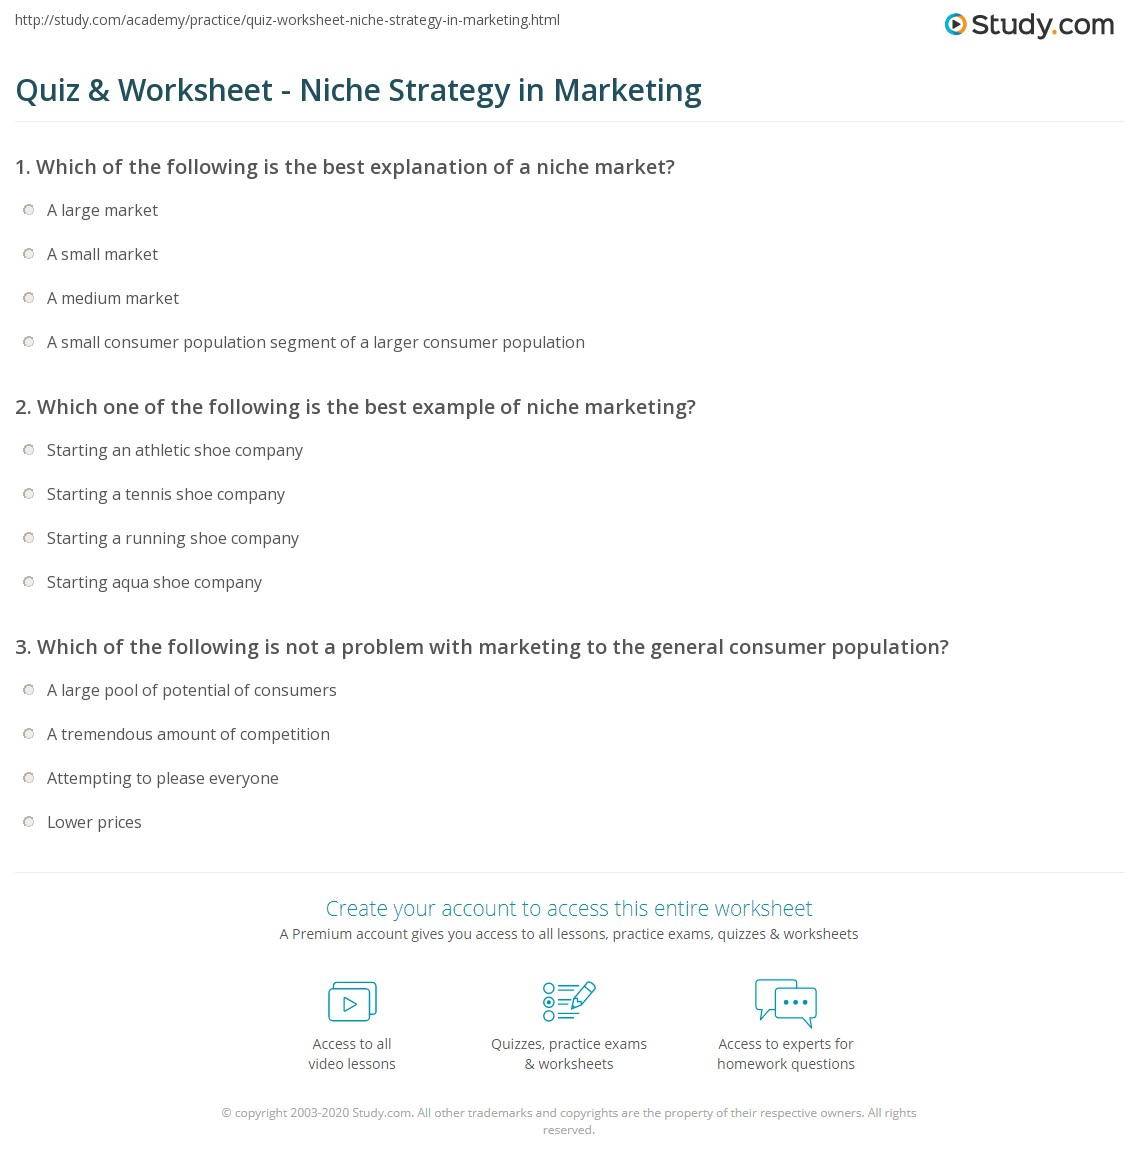 quiz worksheet niche strategy in marketing. Black Bedroom Furniture Sets. Home Design Ideas